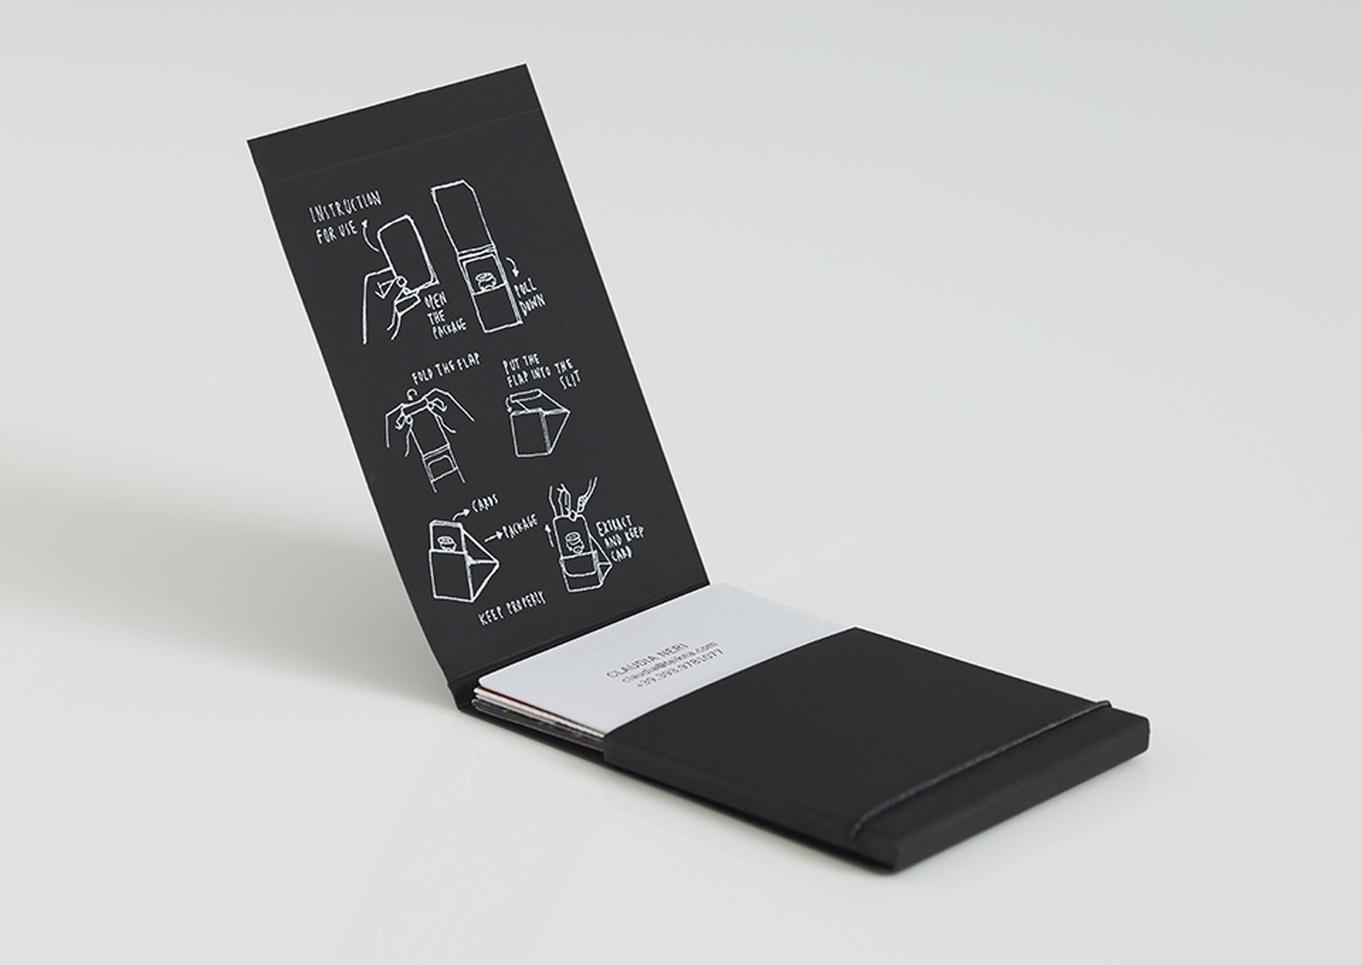 Teikna Design business card and display - Graphis